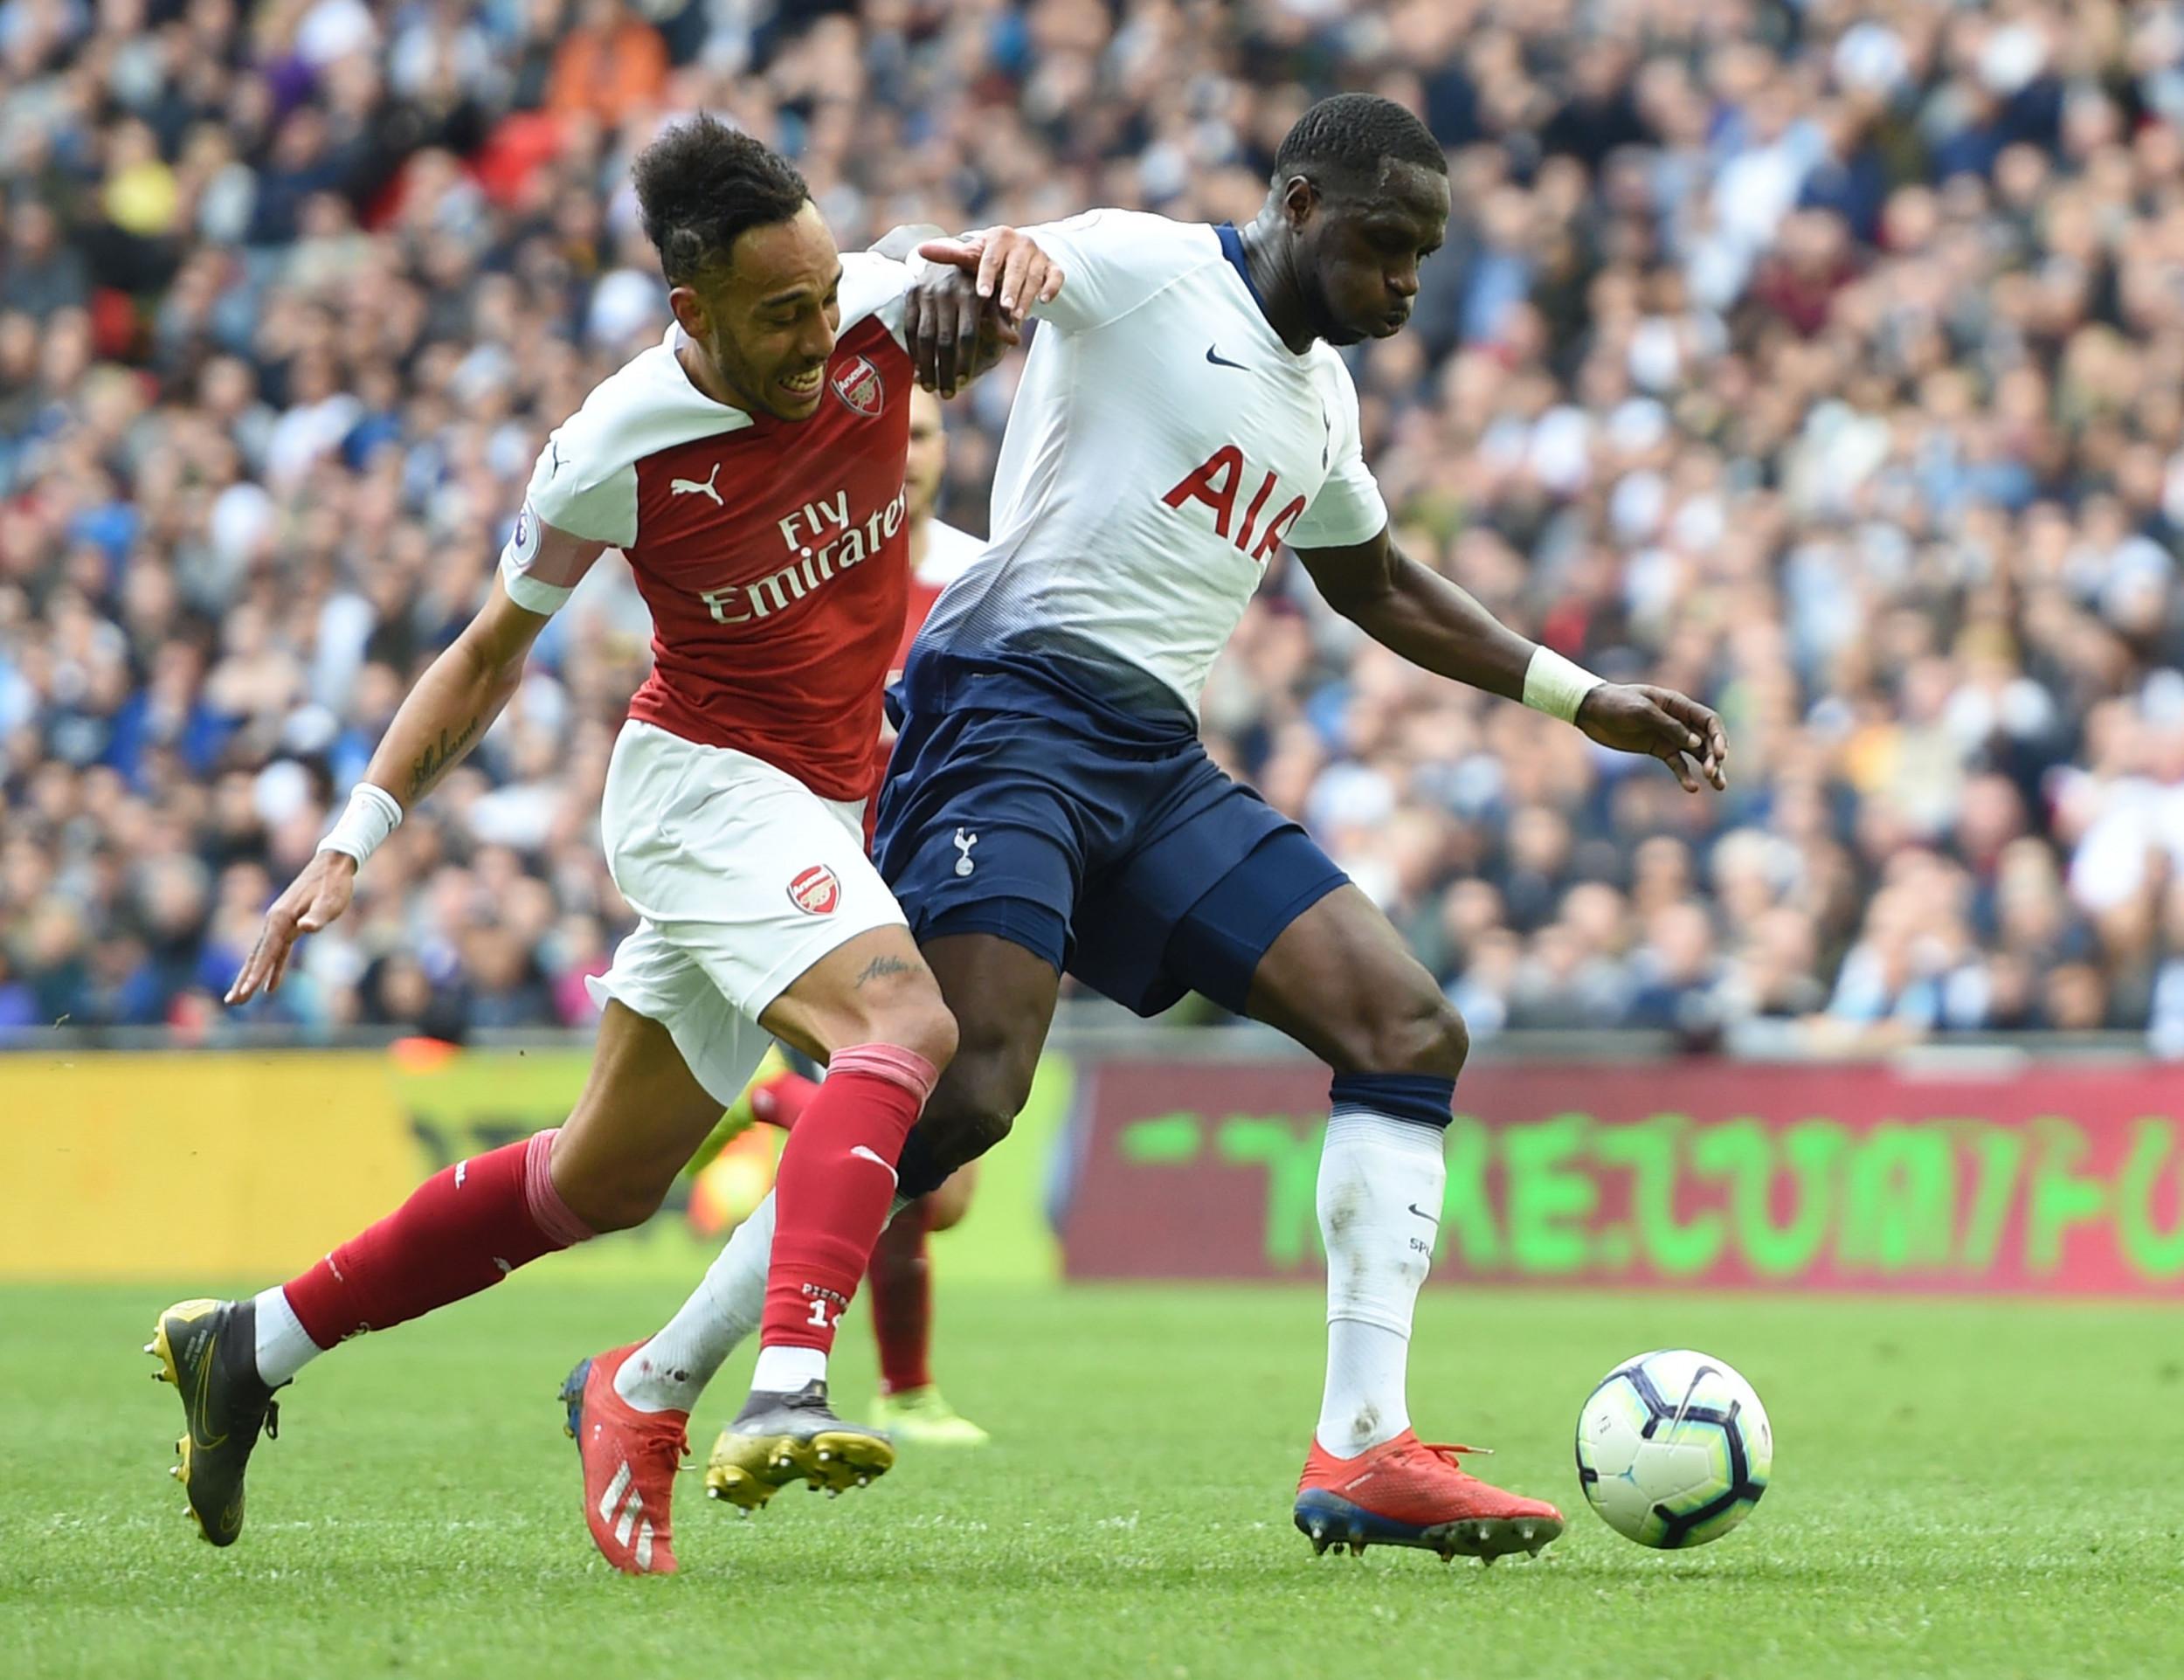 Arsenal vs Tottenham: TV channel, live stream, squ ...Tottenham Vs Arsenal